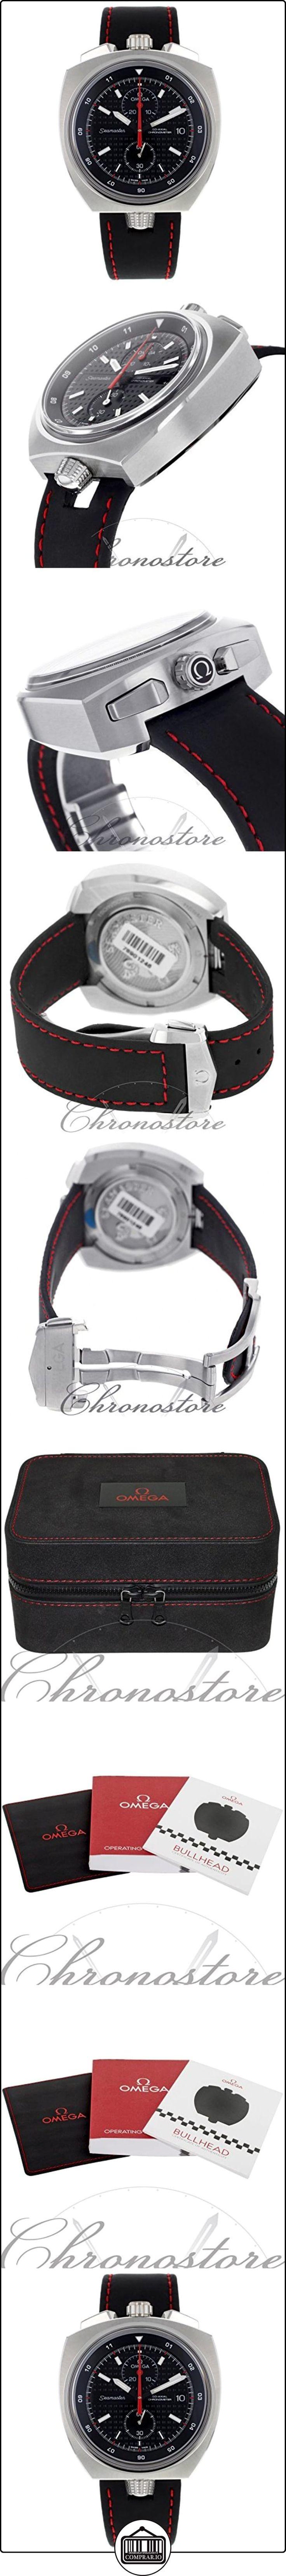 Omega Seamaster Bullhead coaxial Cronógrafo 225.12.43.50.01.001Reloj para hombre  ✿ Relojes para hombre - (Lujo) ✿